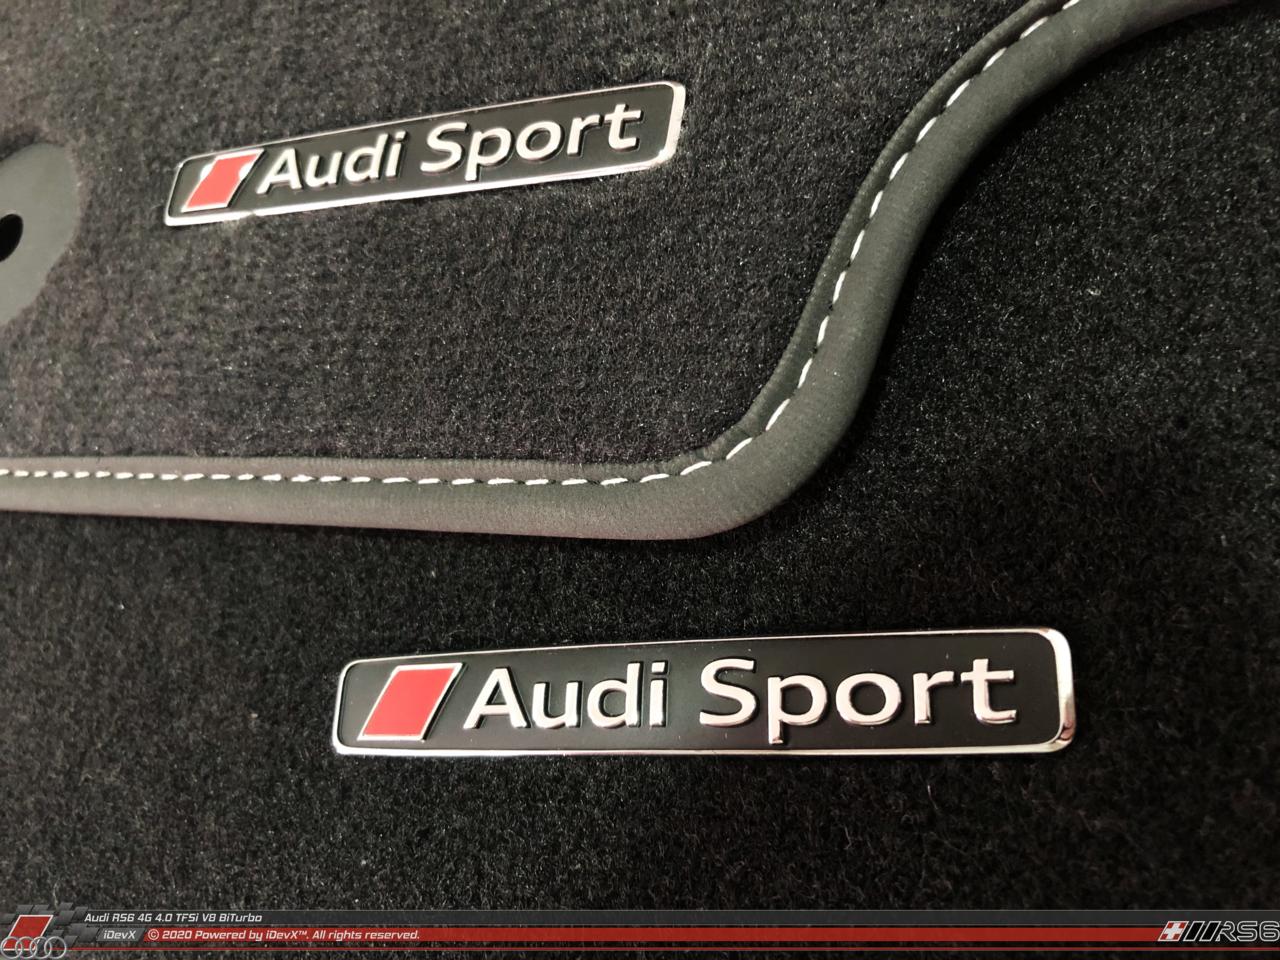 15_08.2019_Audi-RS6_iDevX_010.png